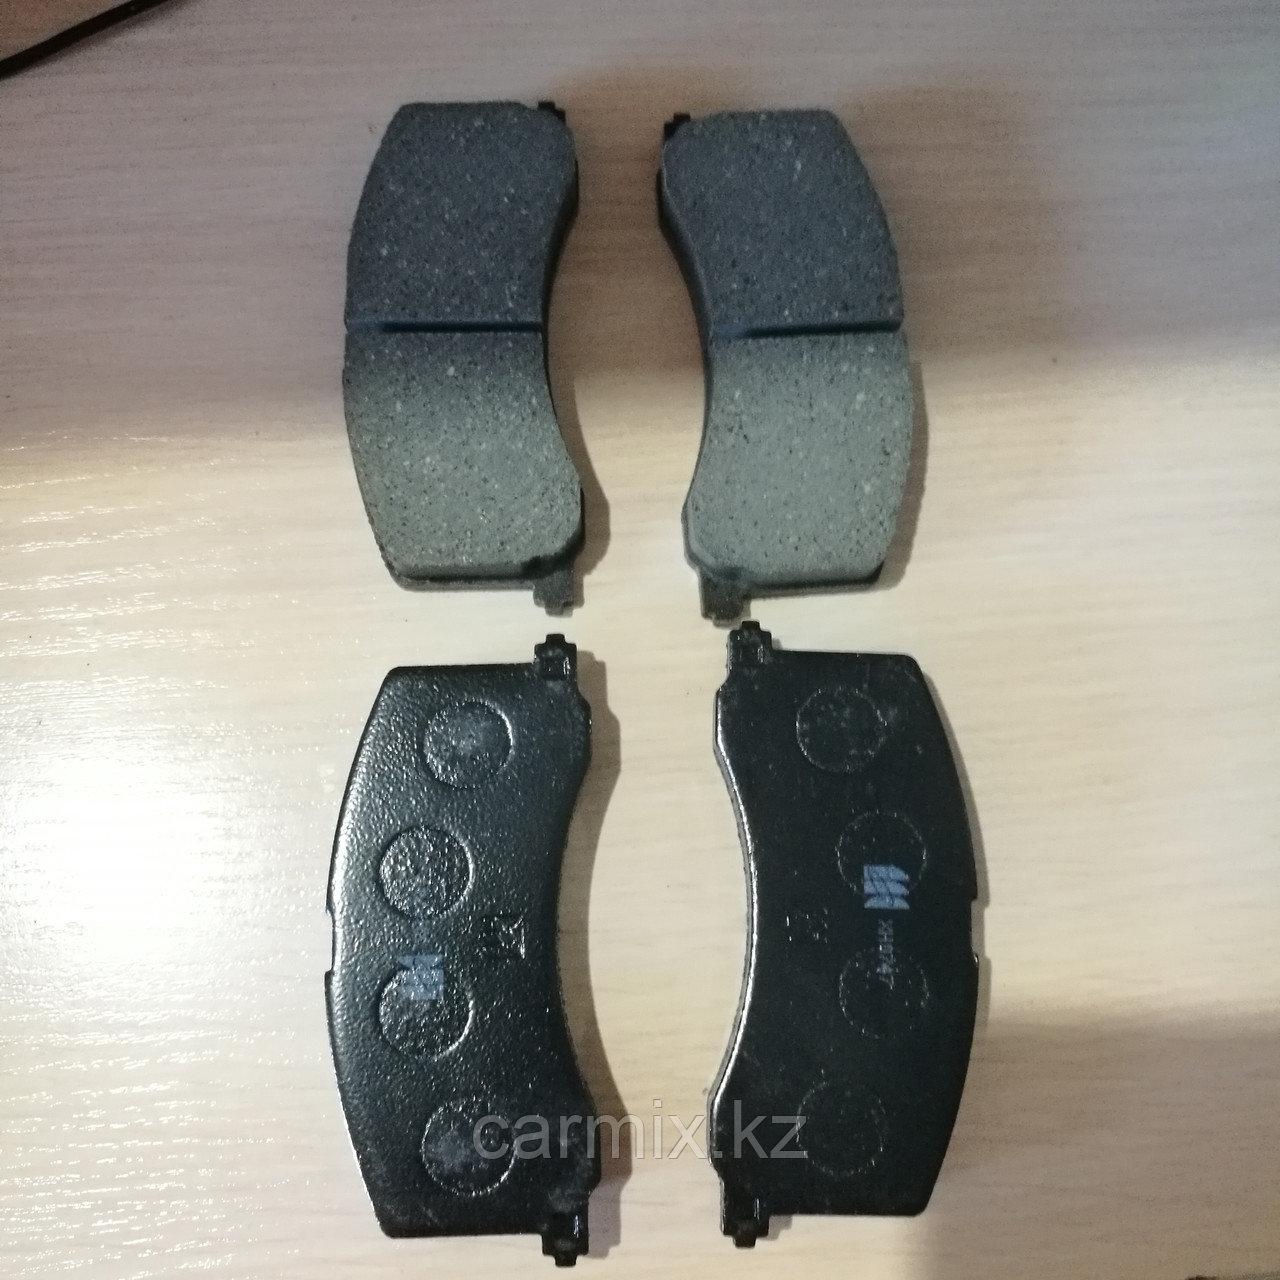 Тормозные колодки передние SUZUKI BALENO SY416, SY413, SY418